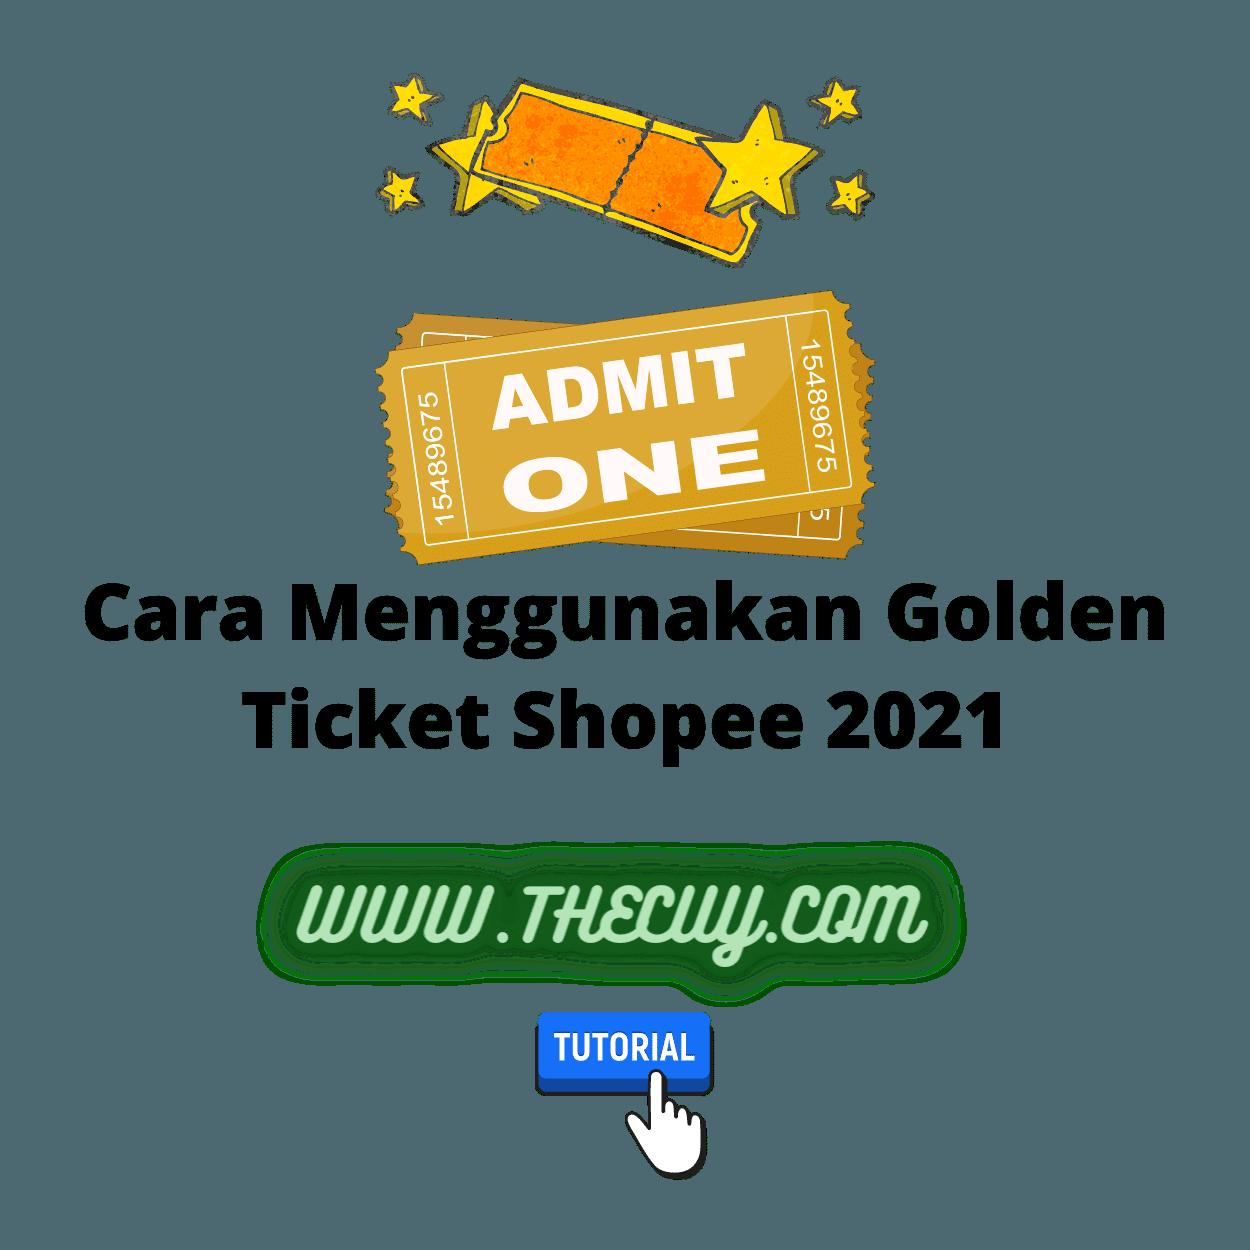 Cara Menggunakan Golden Ticket Shopee 2021